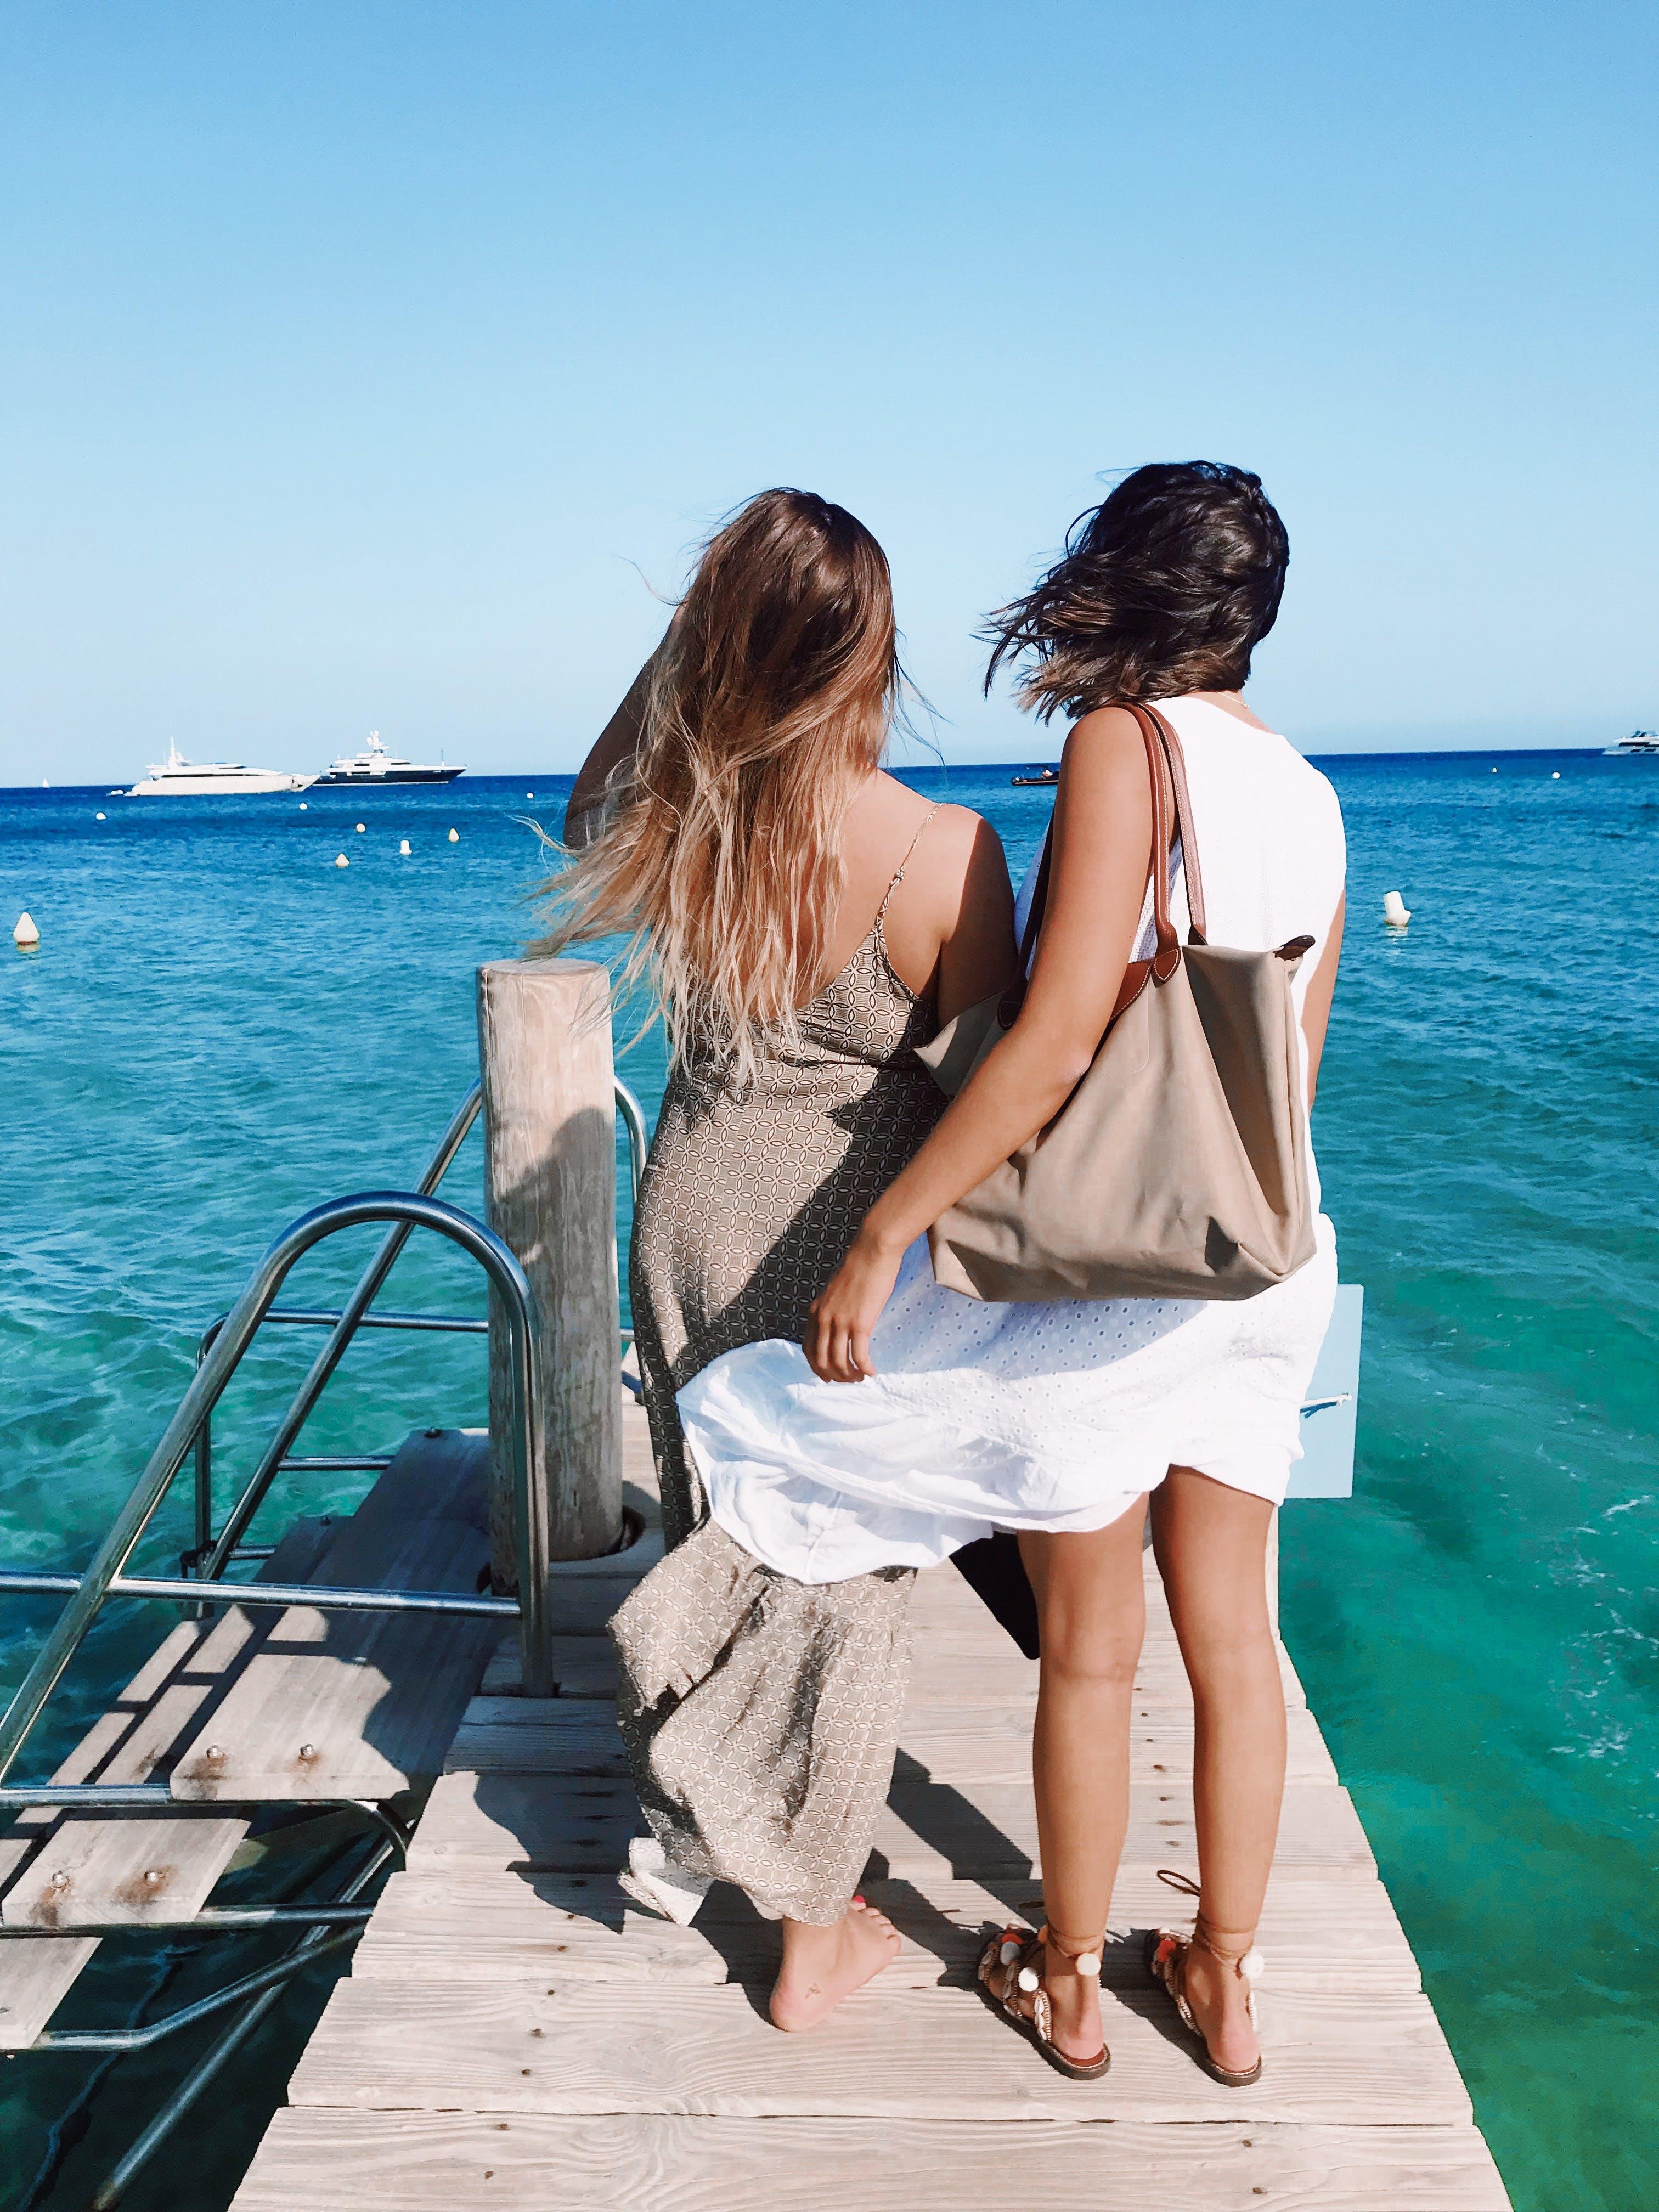 Two Women Standing on Wooden Footbridge Above the Sea